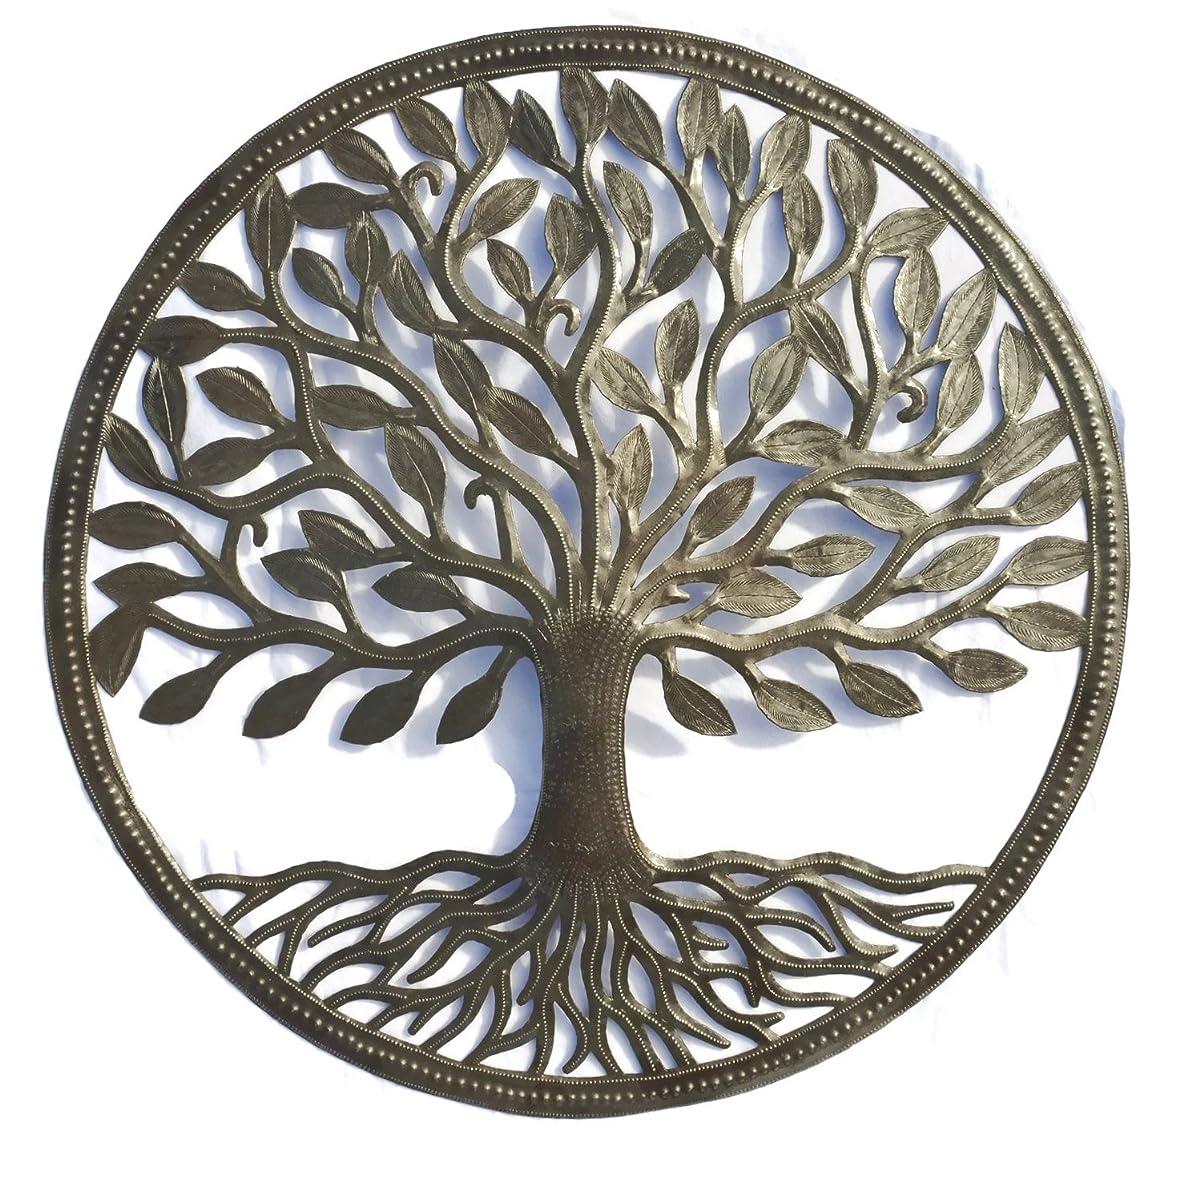 "Steel Drum Organic Tree of Life Recycled Metal Art from Haiti , 23"" X 23"""